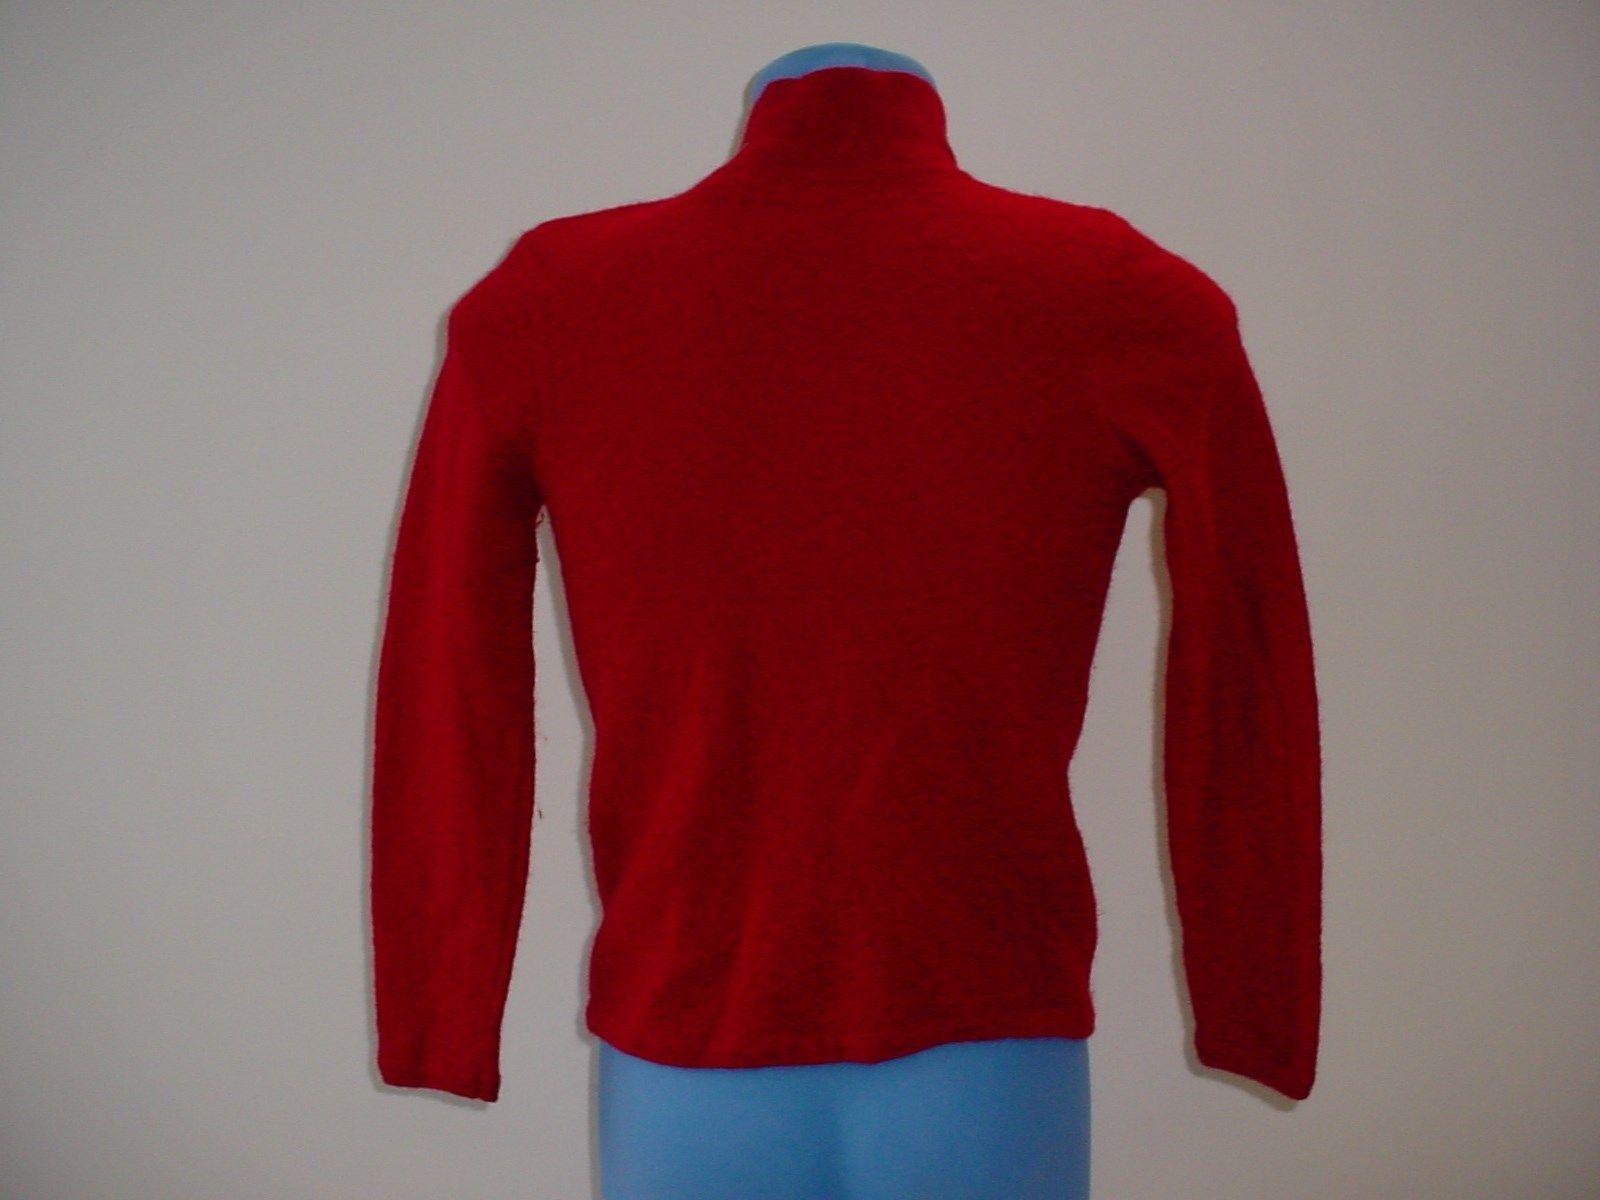 bca23245491 Dress Barn Ugly Christmas Sweater Zip Up and 50 similar items